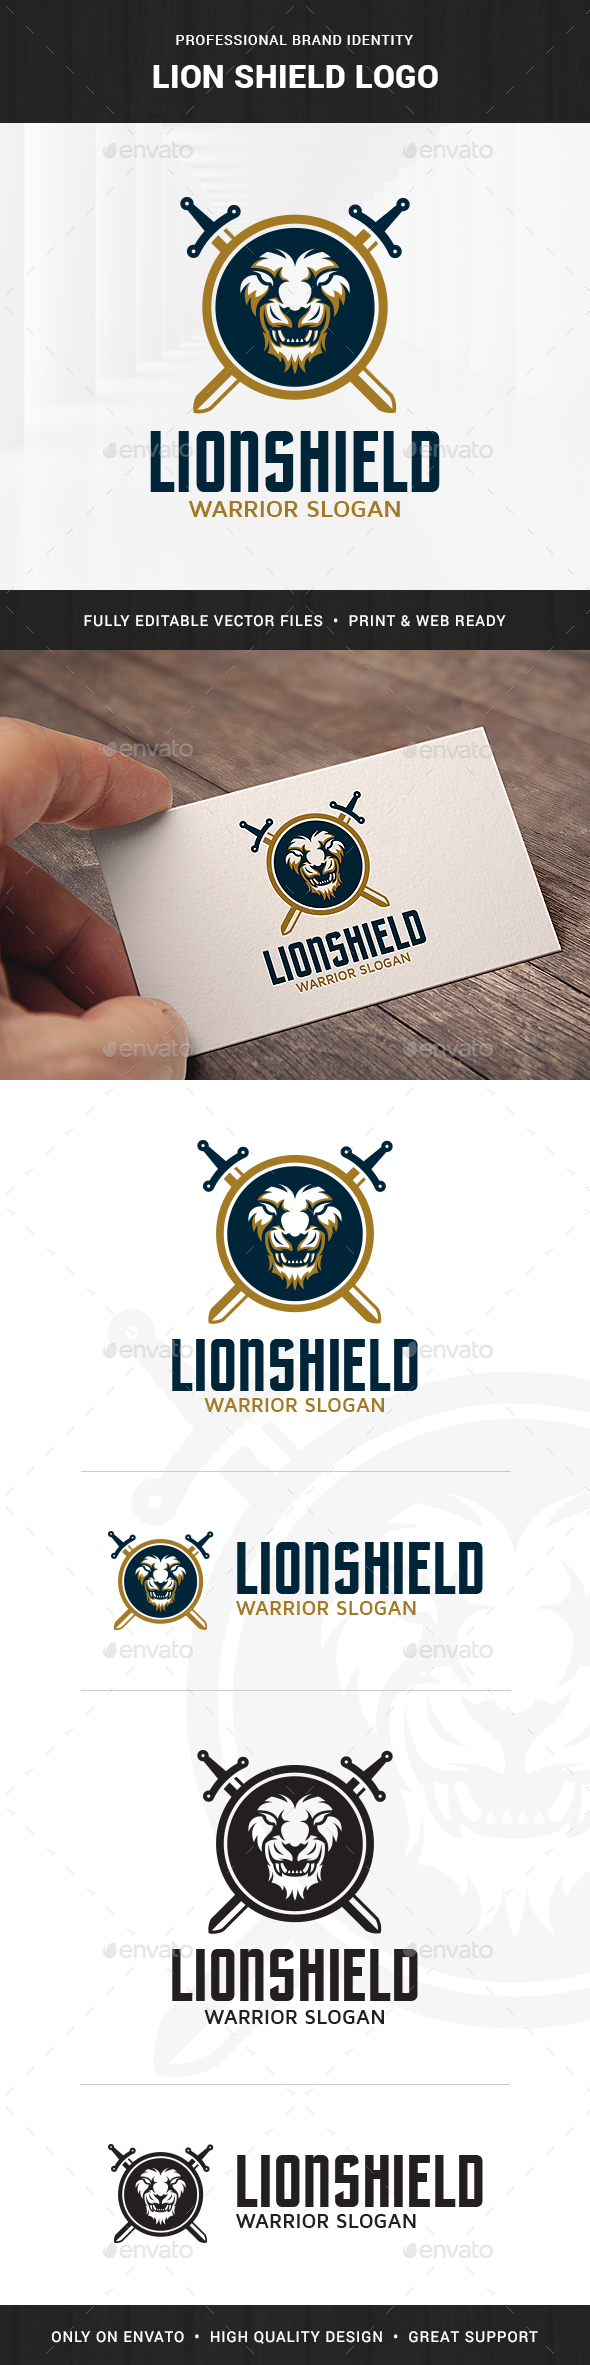 Lion Shield Logo Template - Animals Logo Templates